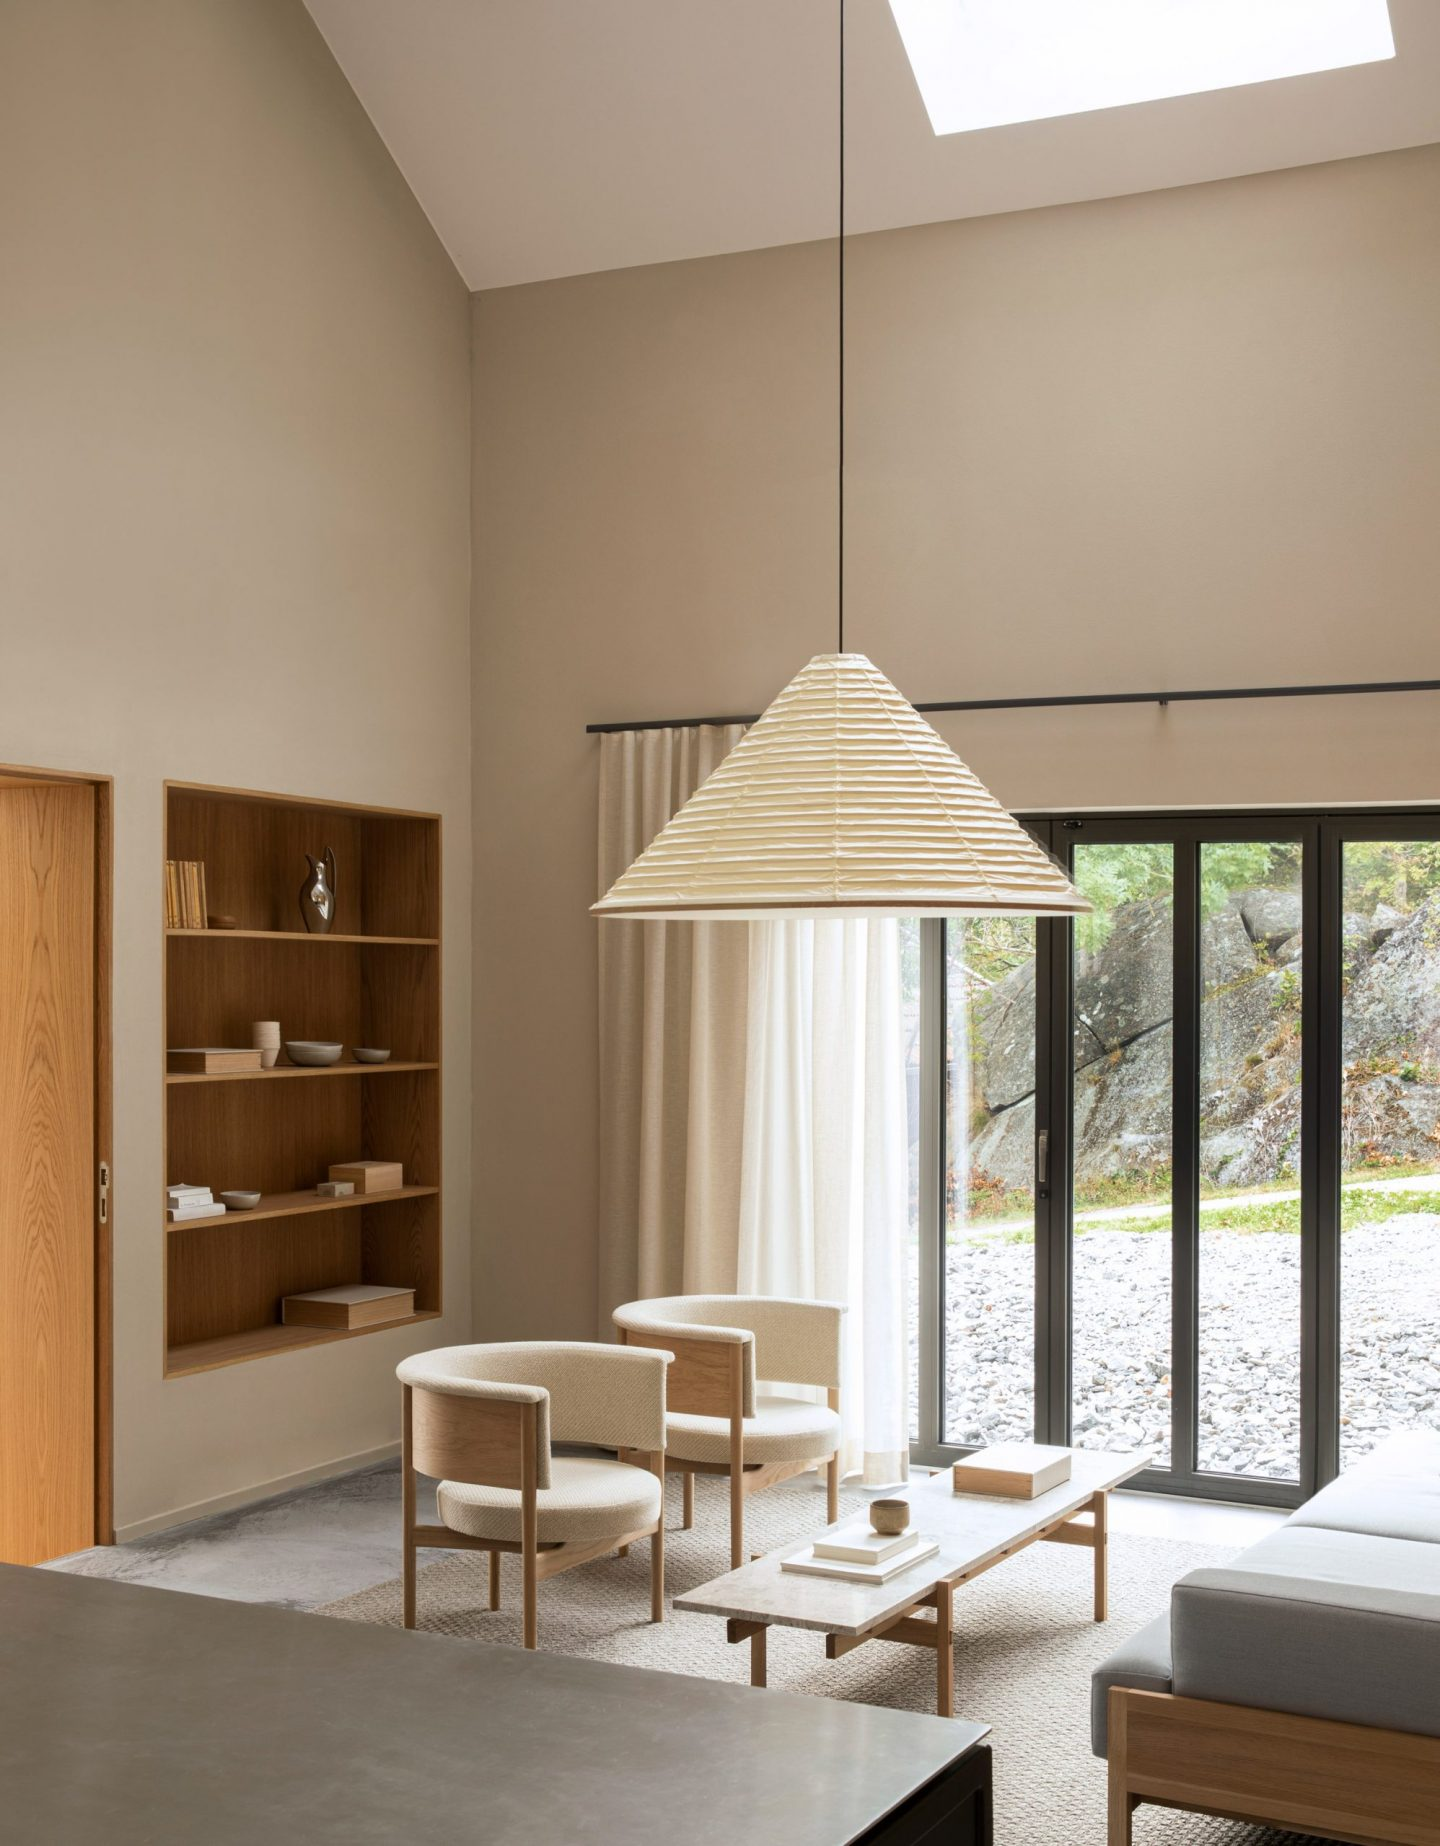 IGNANT-Architecture-Norm-Architects-Archipelago-House-012